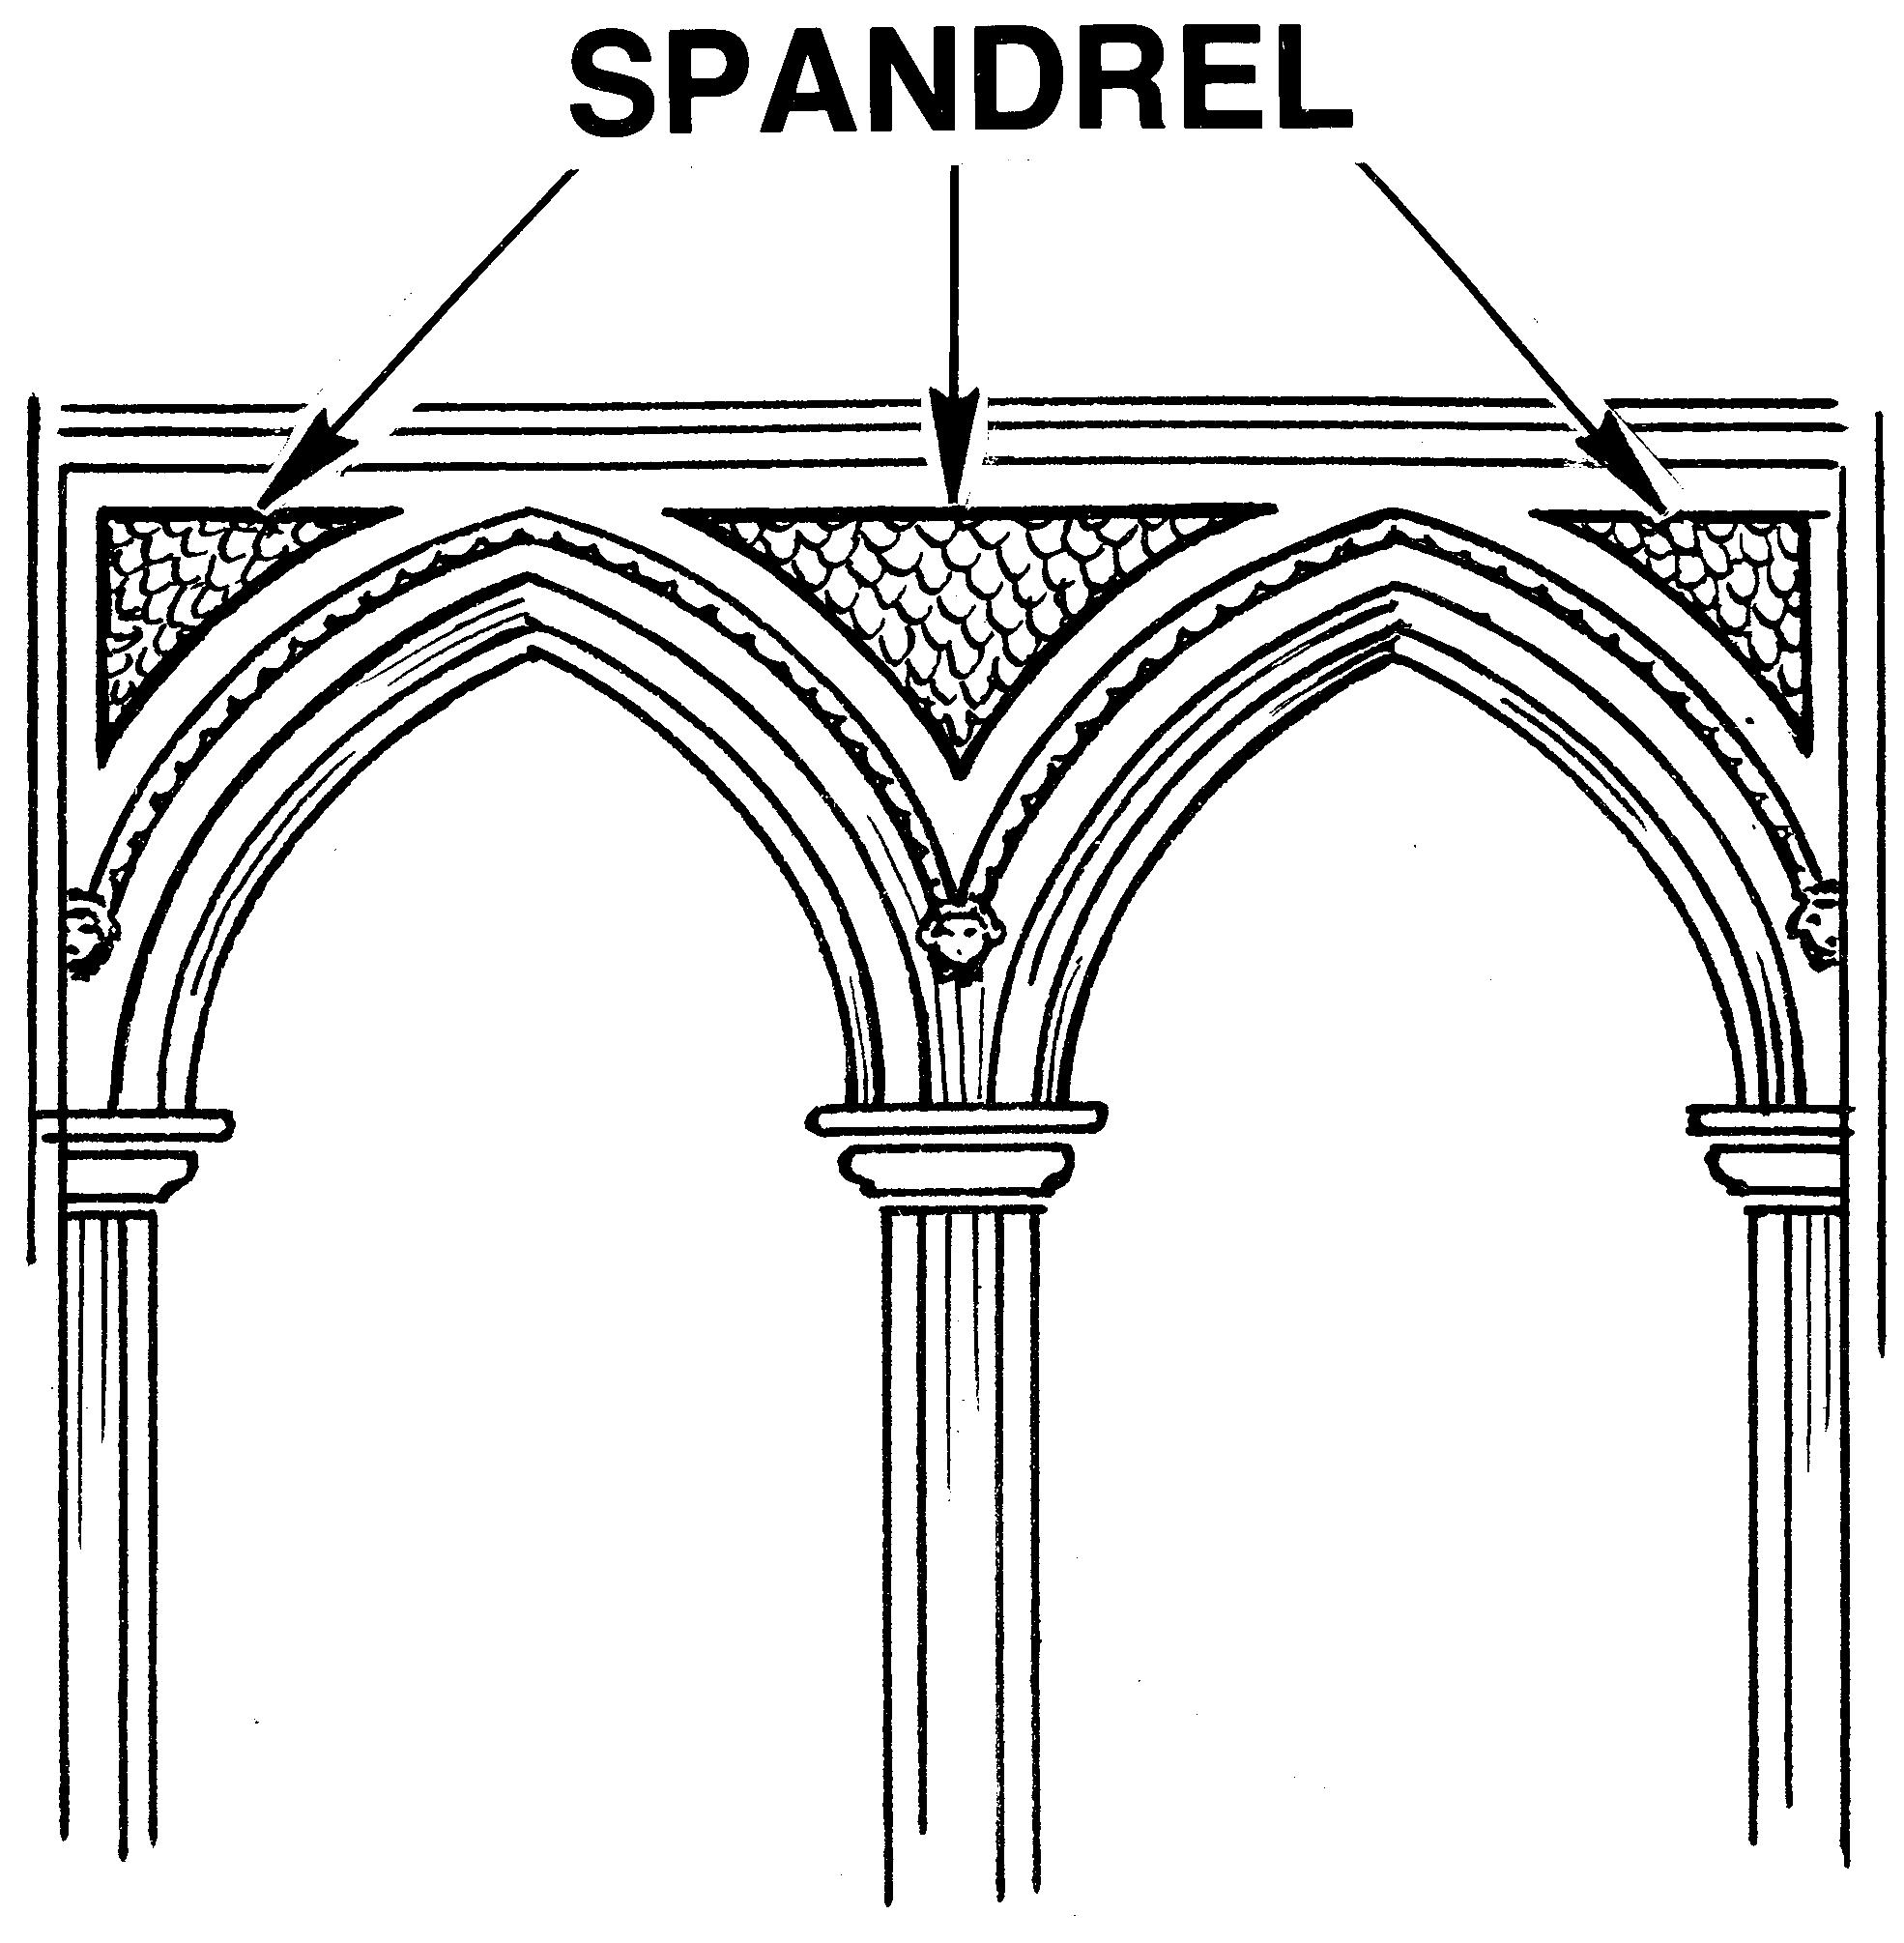 SPANDREL Google Search Arch, Architecture details